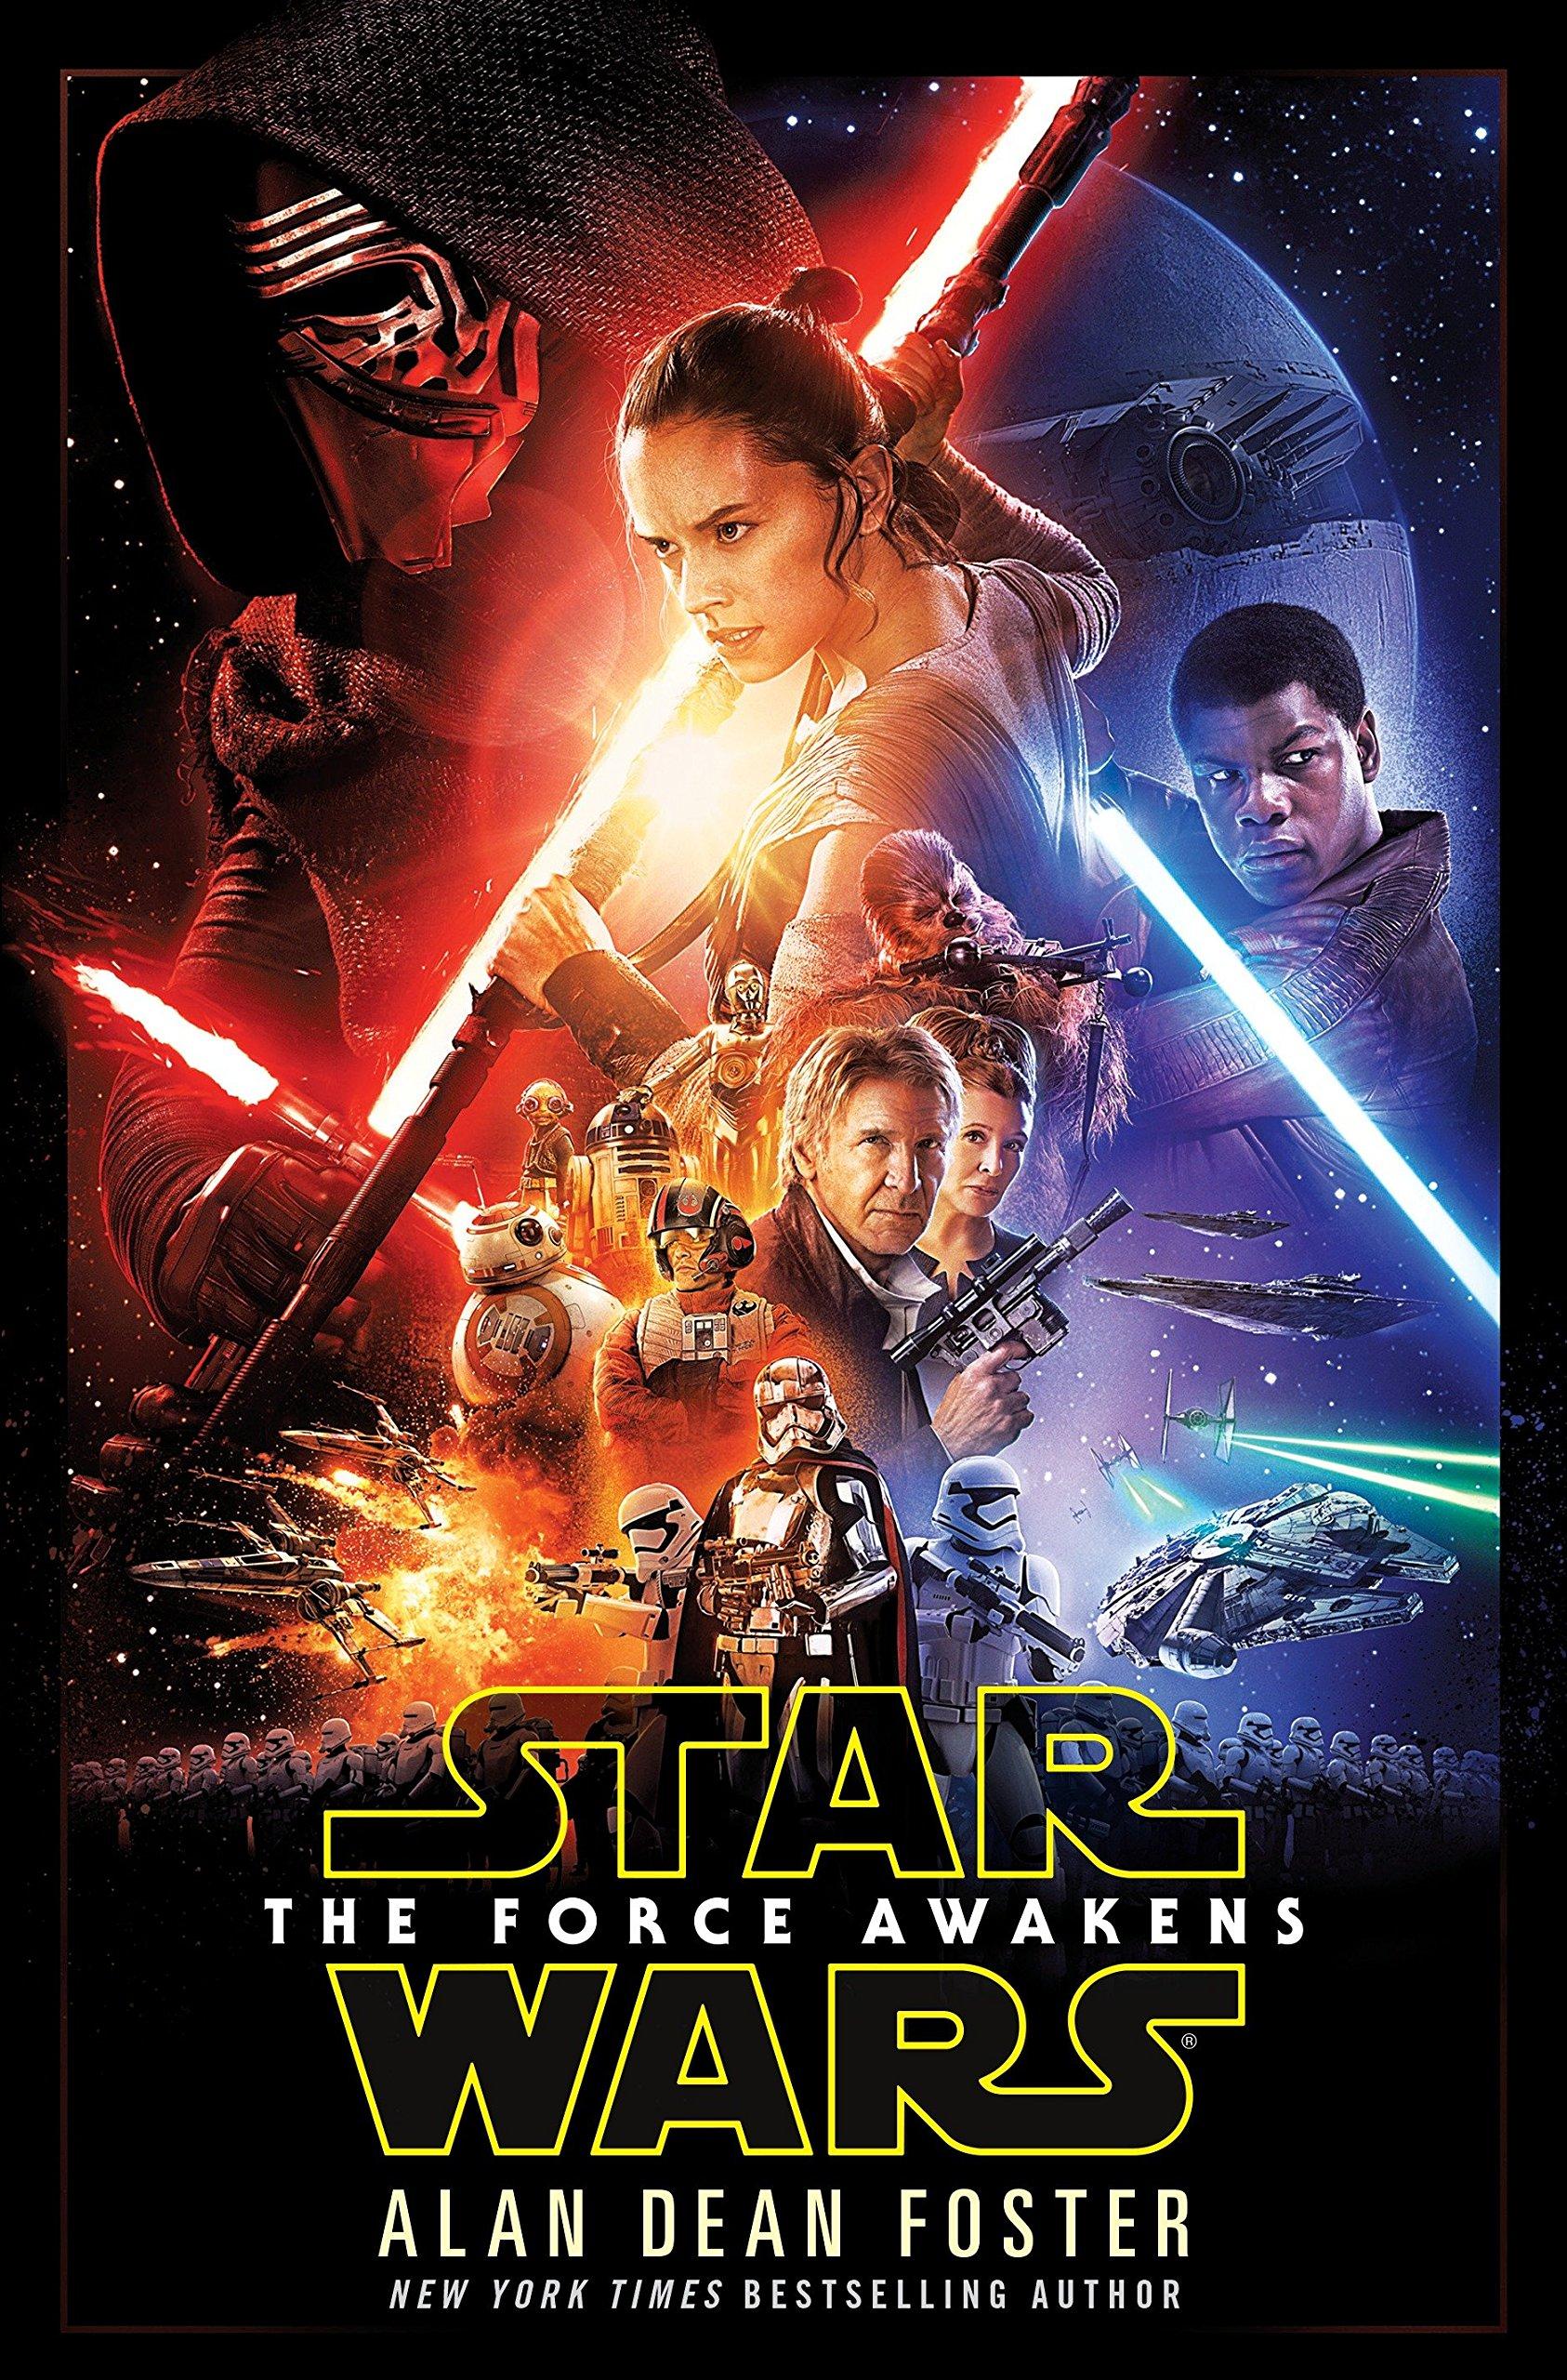 The Force Awakens (Inglese) Copertina rigida – 5 gen 2016 Alan Dean Foster Del Rey 1101965495 Fiction